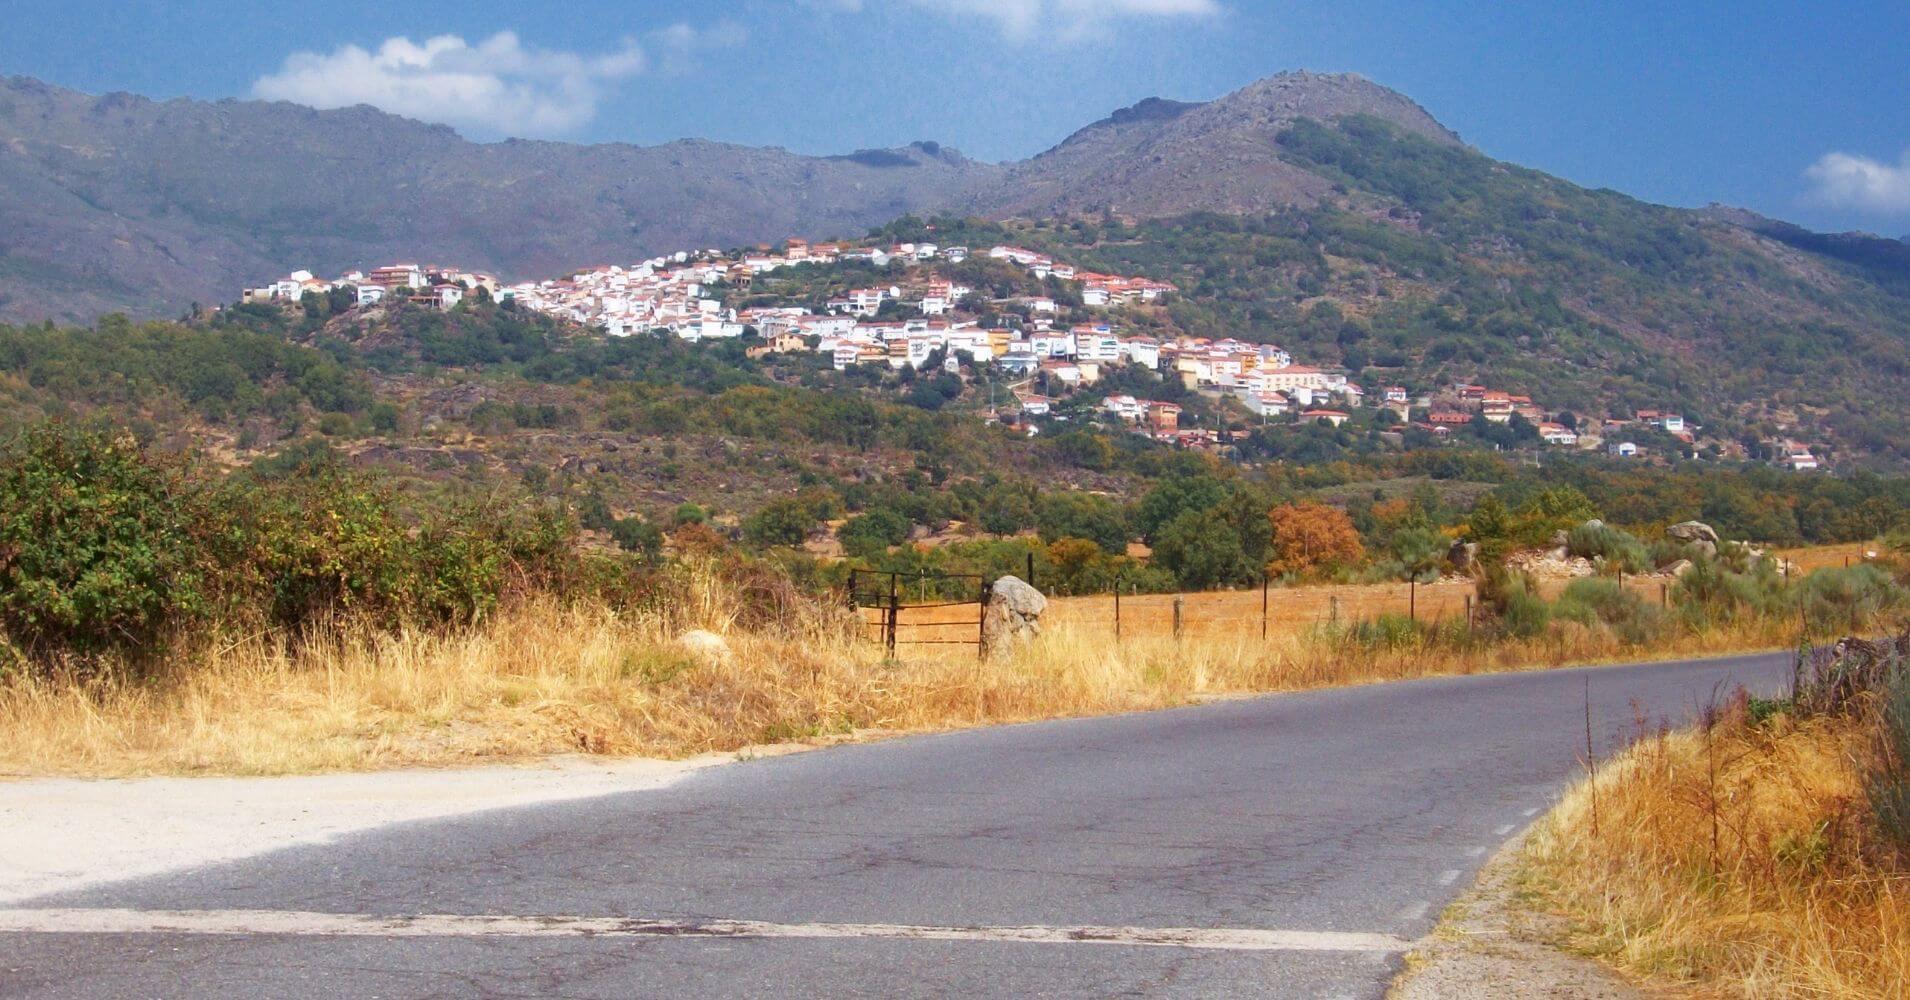 Sierra de Gata, San Martín de Trevejo. Cáceres. Extremadura.